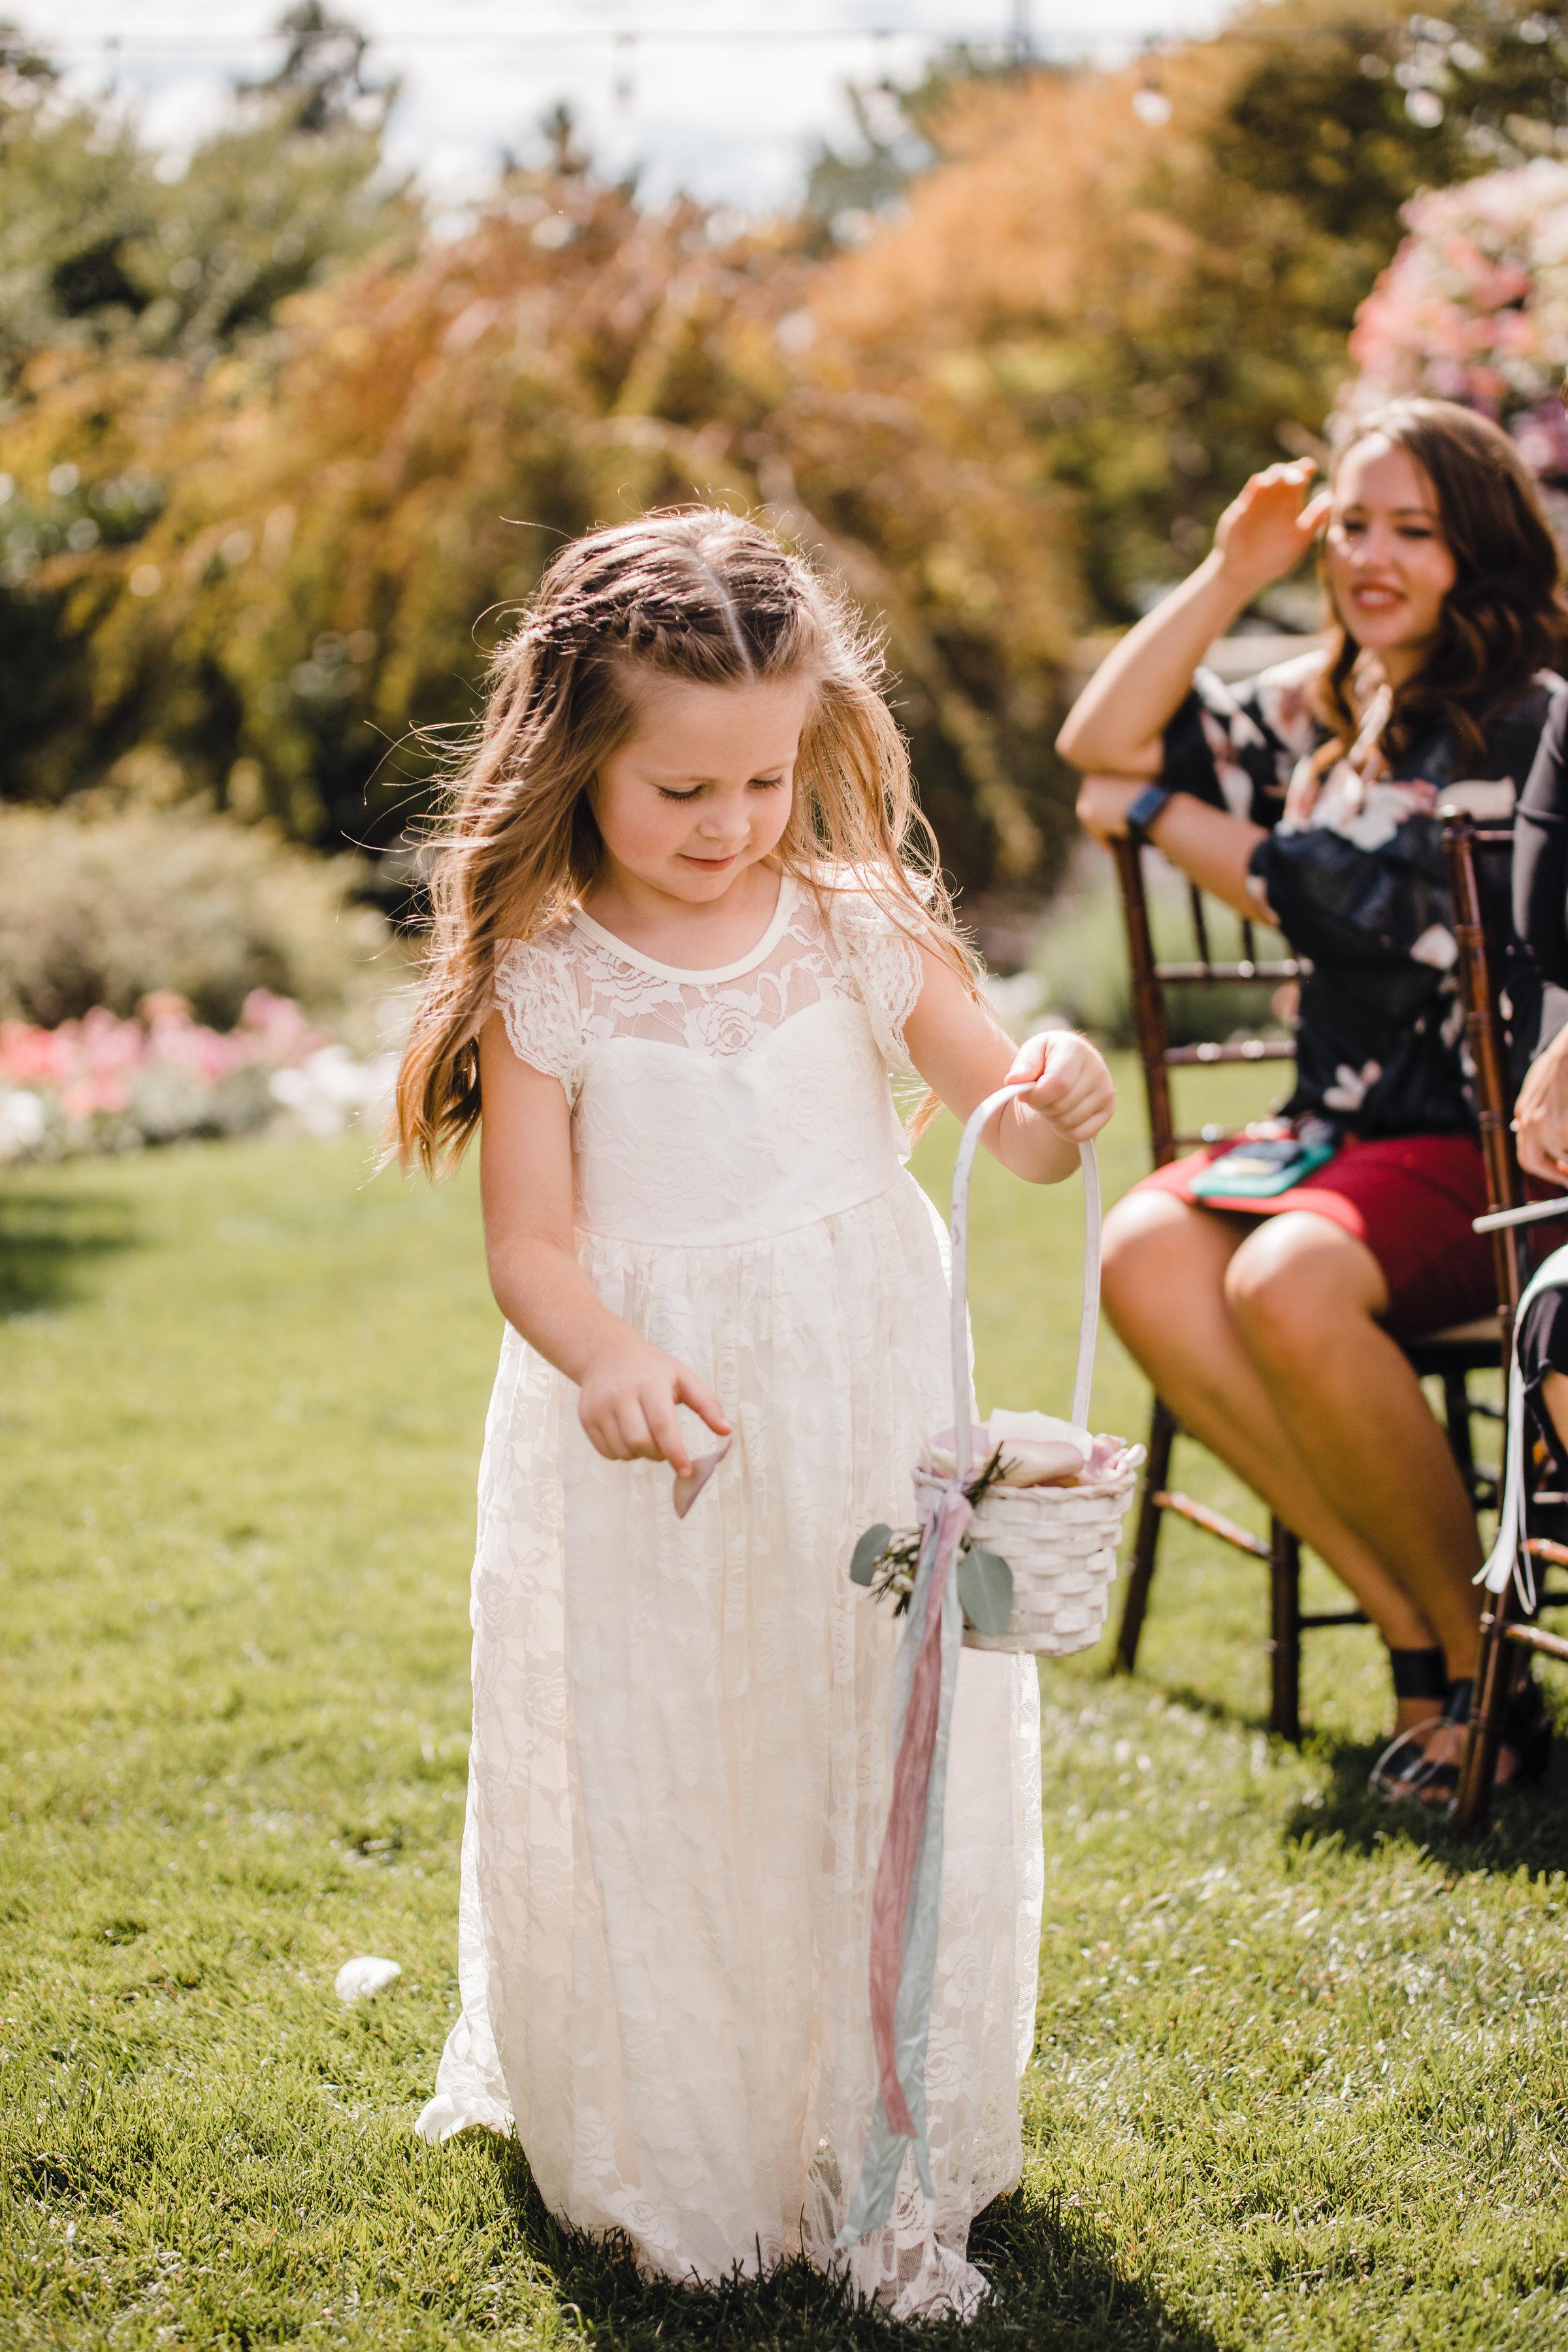 provo utah wedding photographer flower girl outdoor ceremony isle rose petals